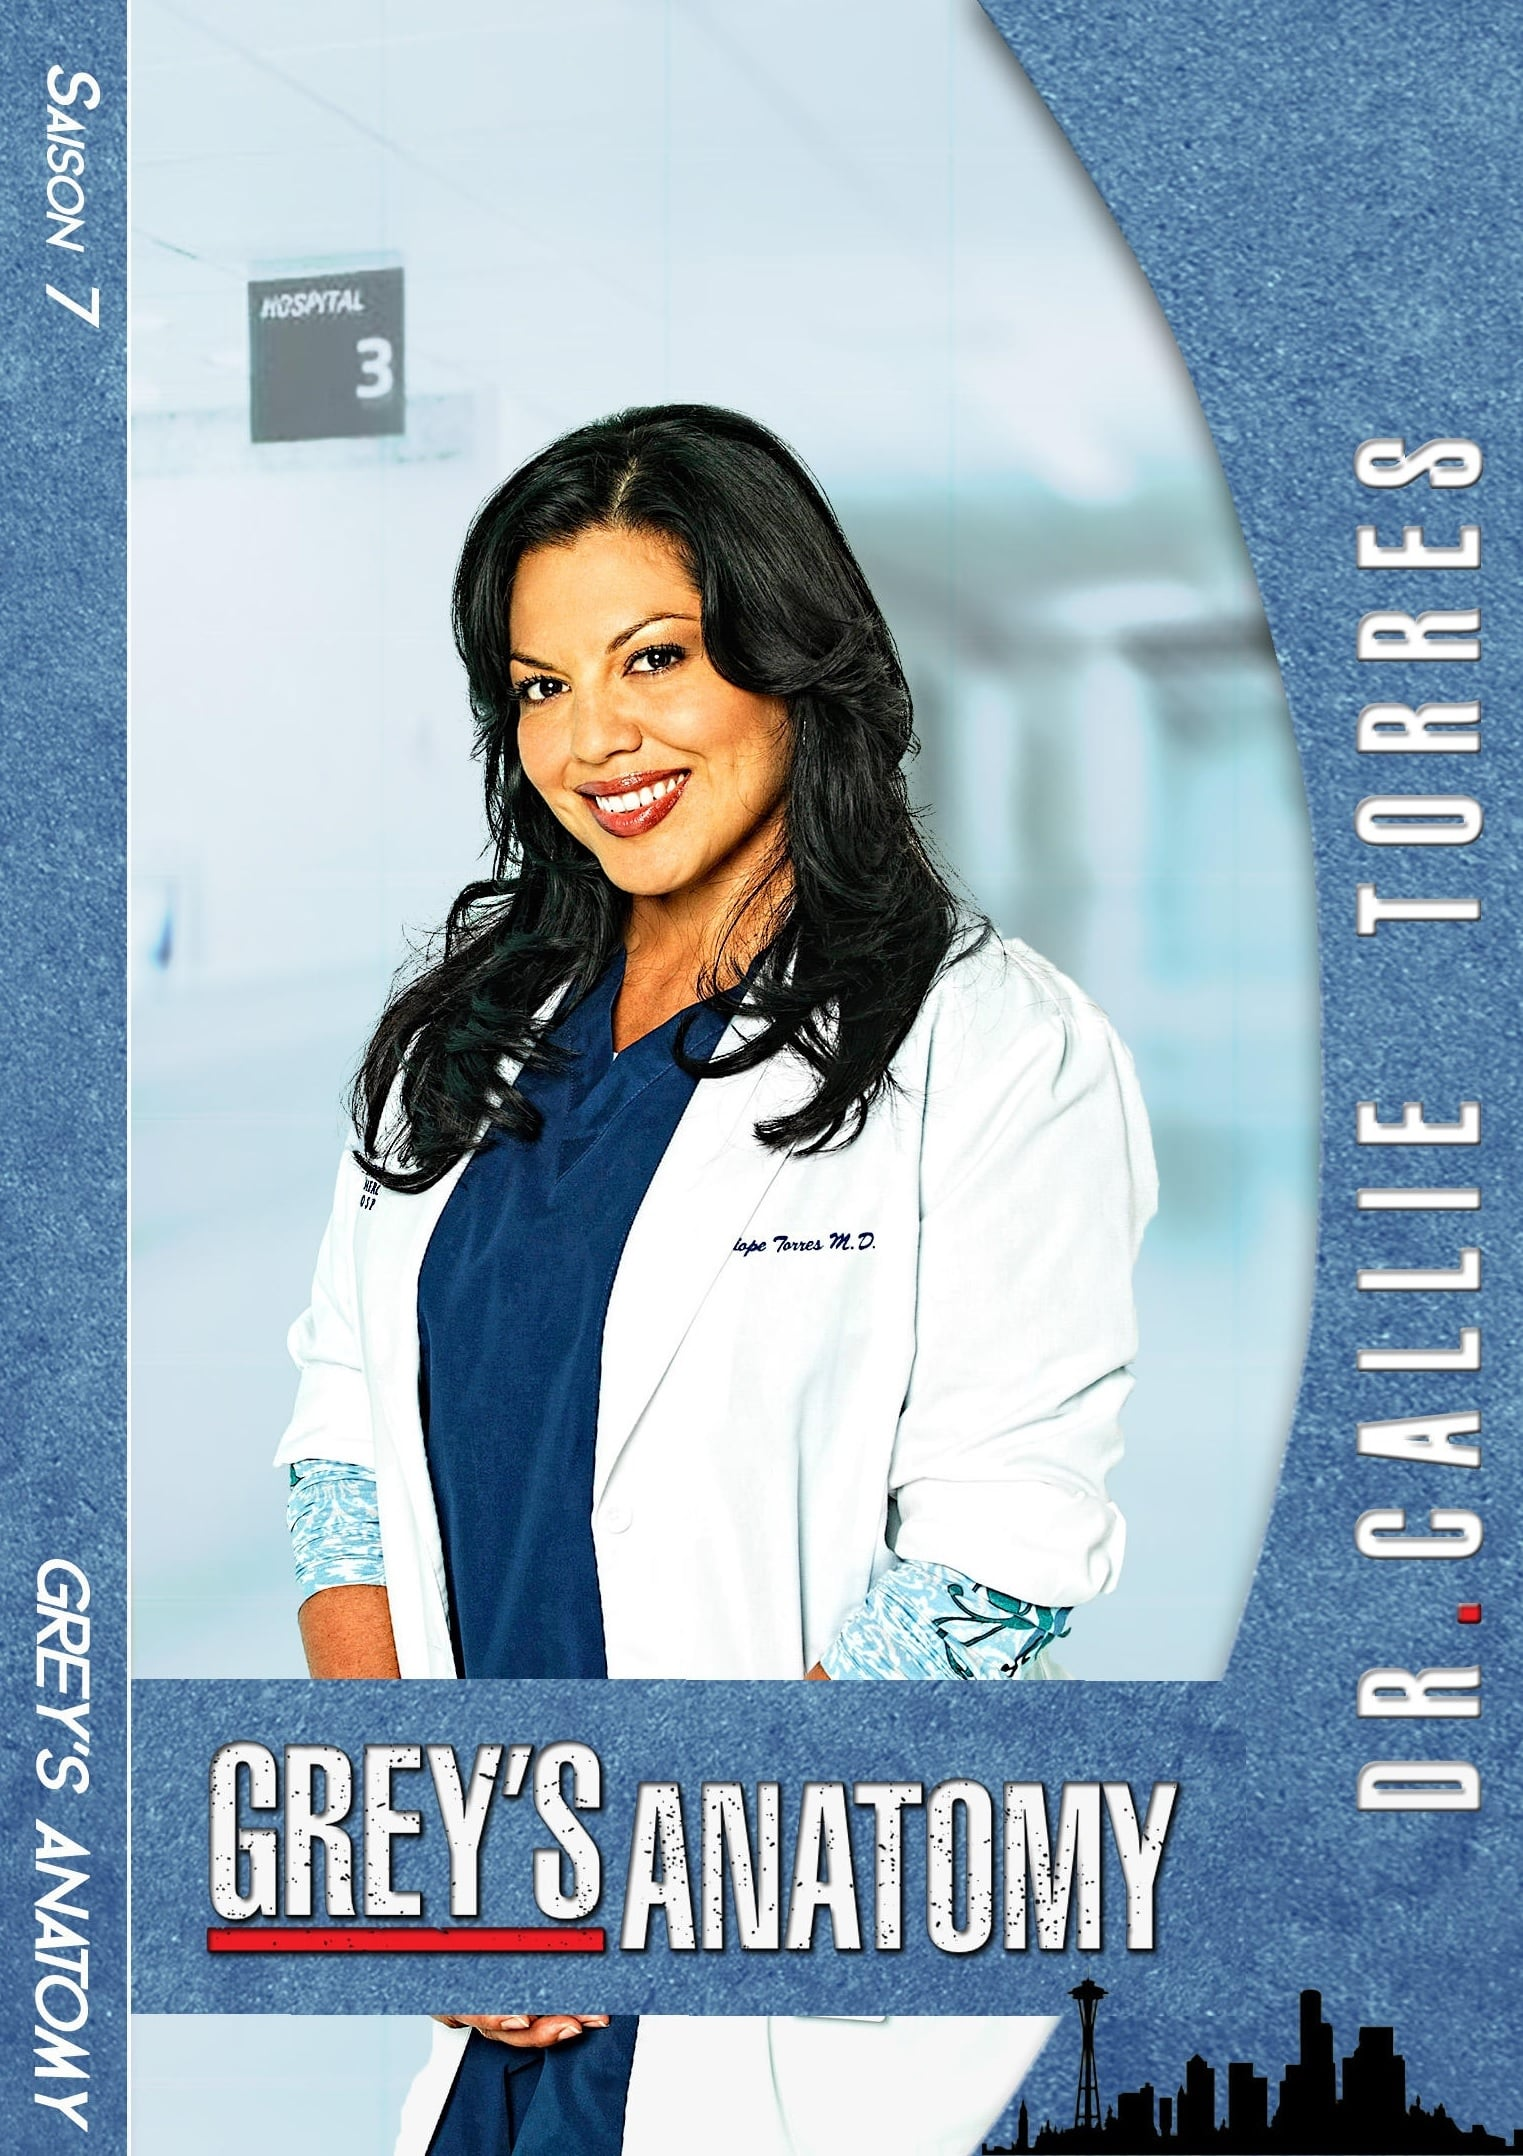 Grey's Anatomy Saison 14 Streaming Gratuit : grey's, anatomy, saison, streaming, gratuit, Greys, Anatomy, Streaming, Saison, Vostfr, Iksticky